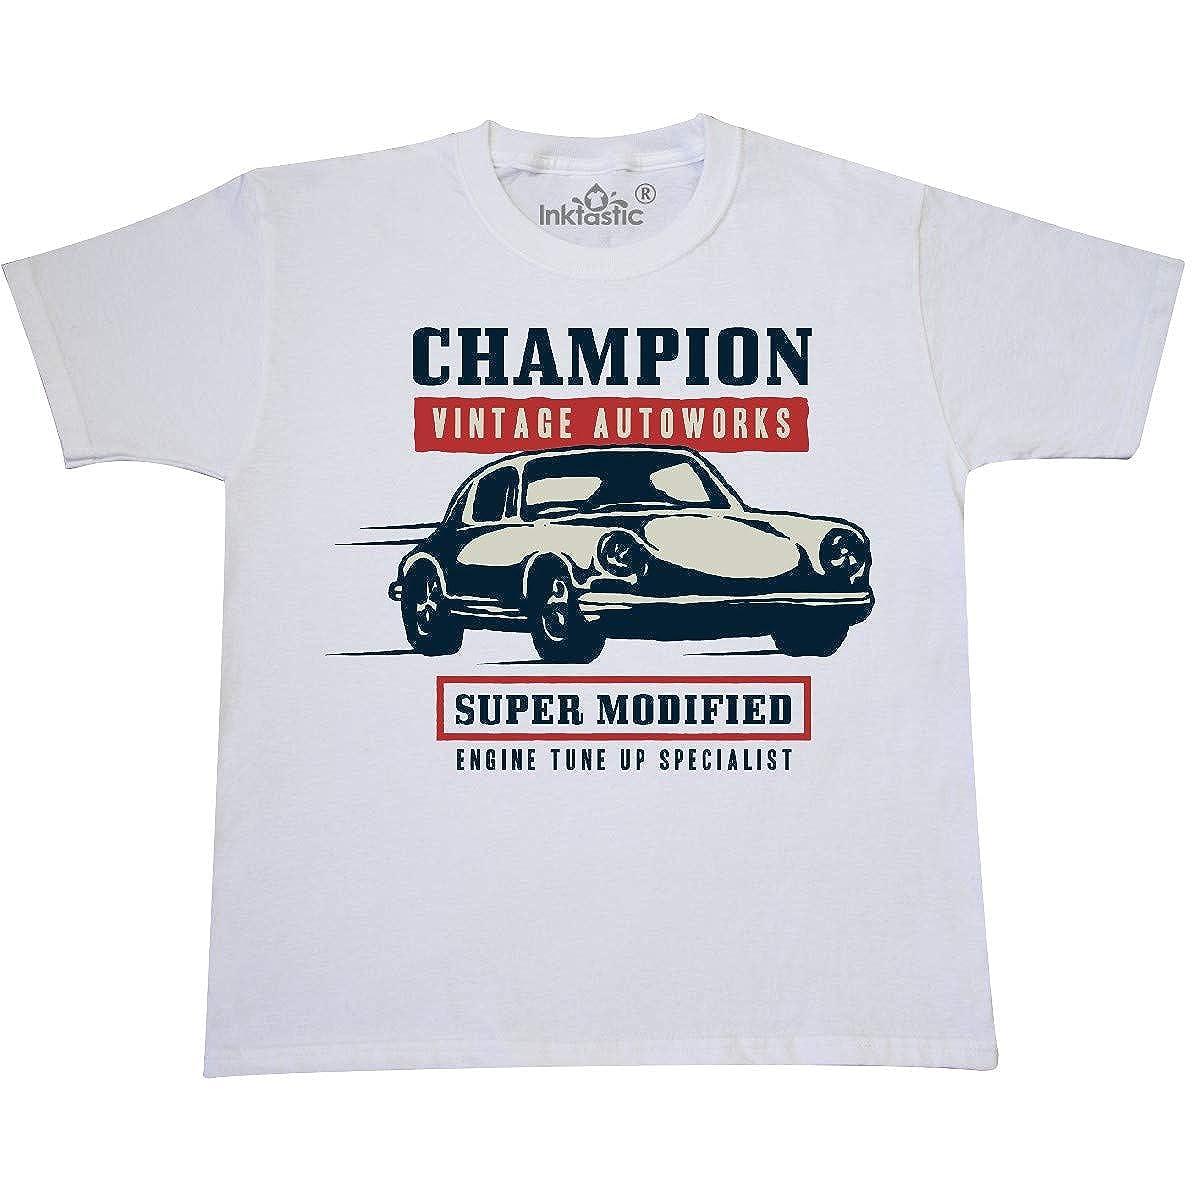 8fdf9172e Amazon.com: inktastic - Classic Racing Champion Youth T-Shirt 339d5:  Clothing